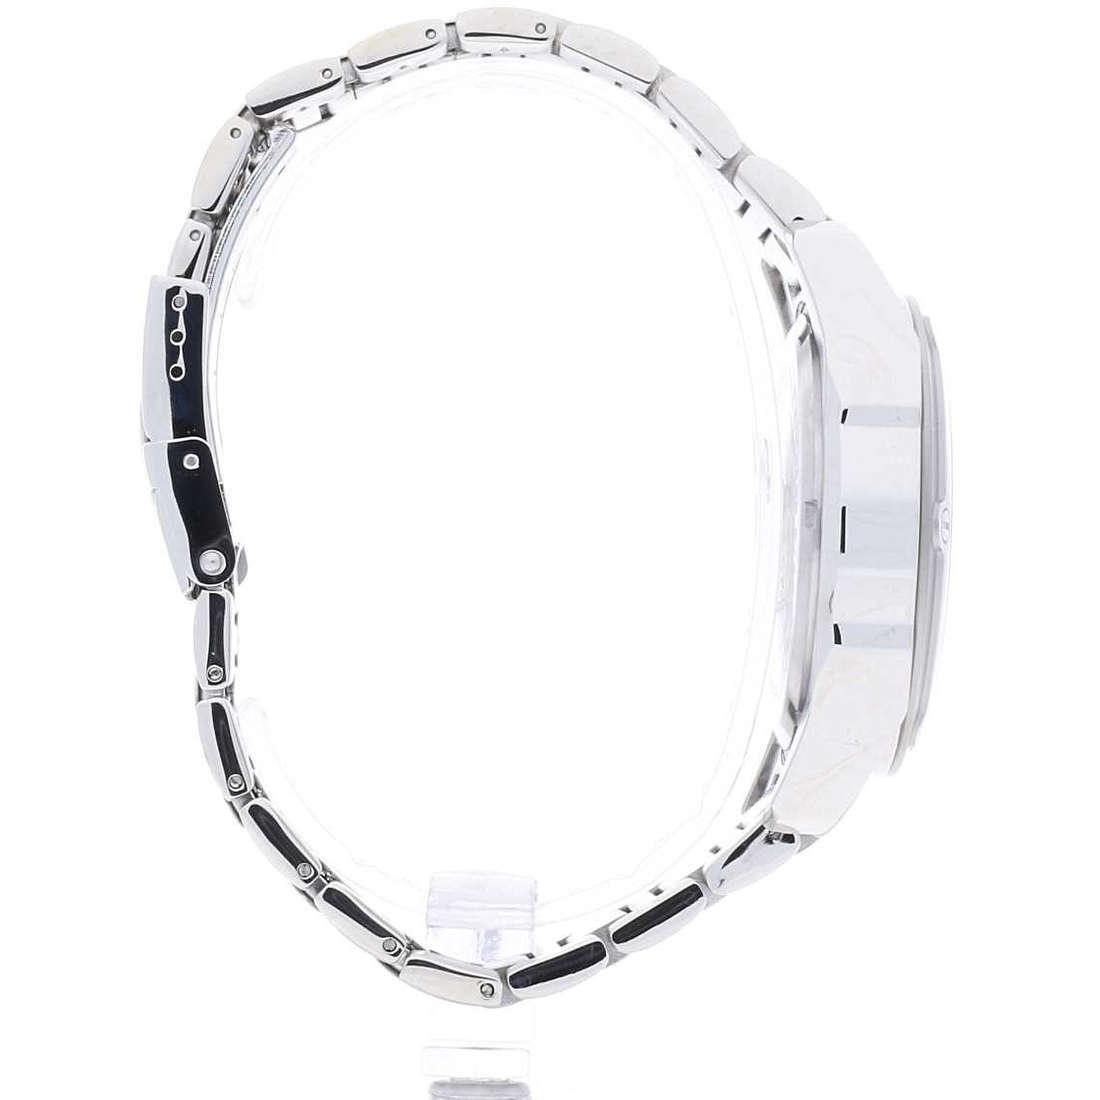 acquista orologi uomo Sector R3273981001